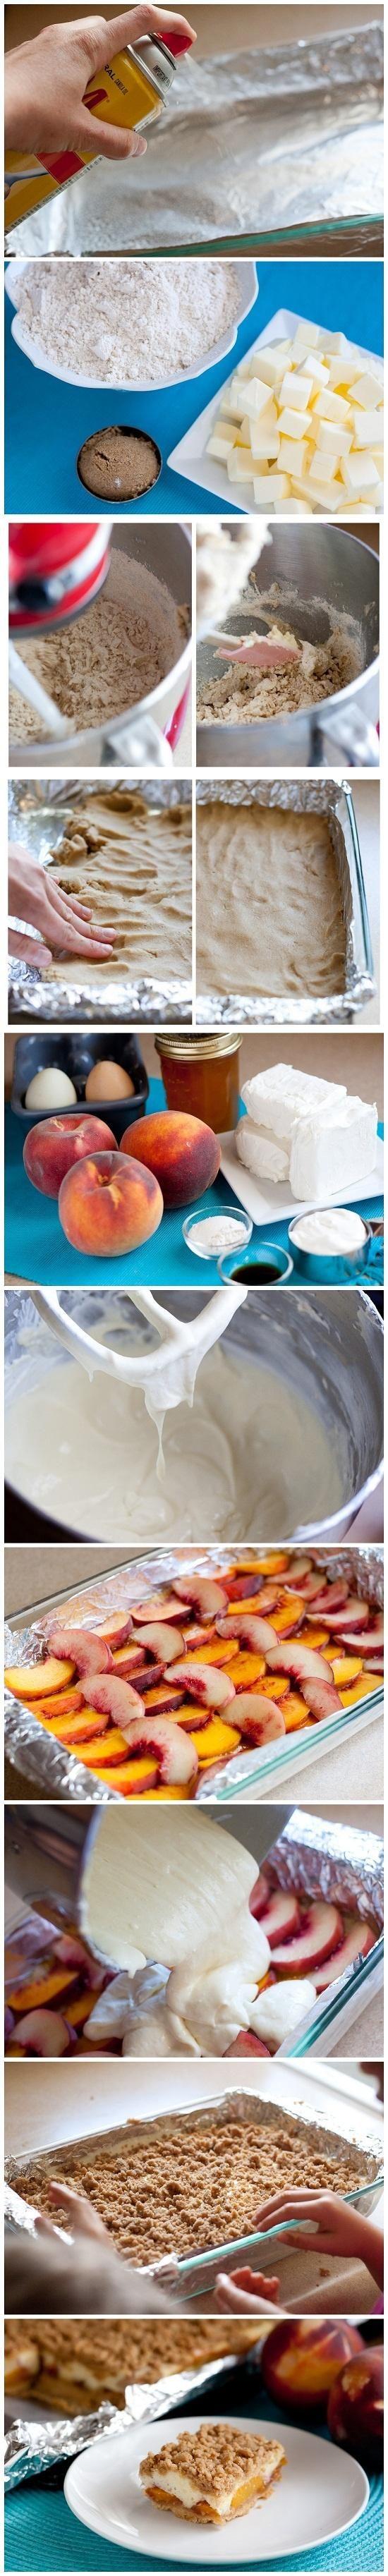 Peaches and Cream Crumble Bars